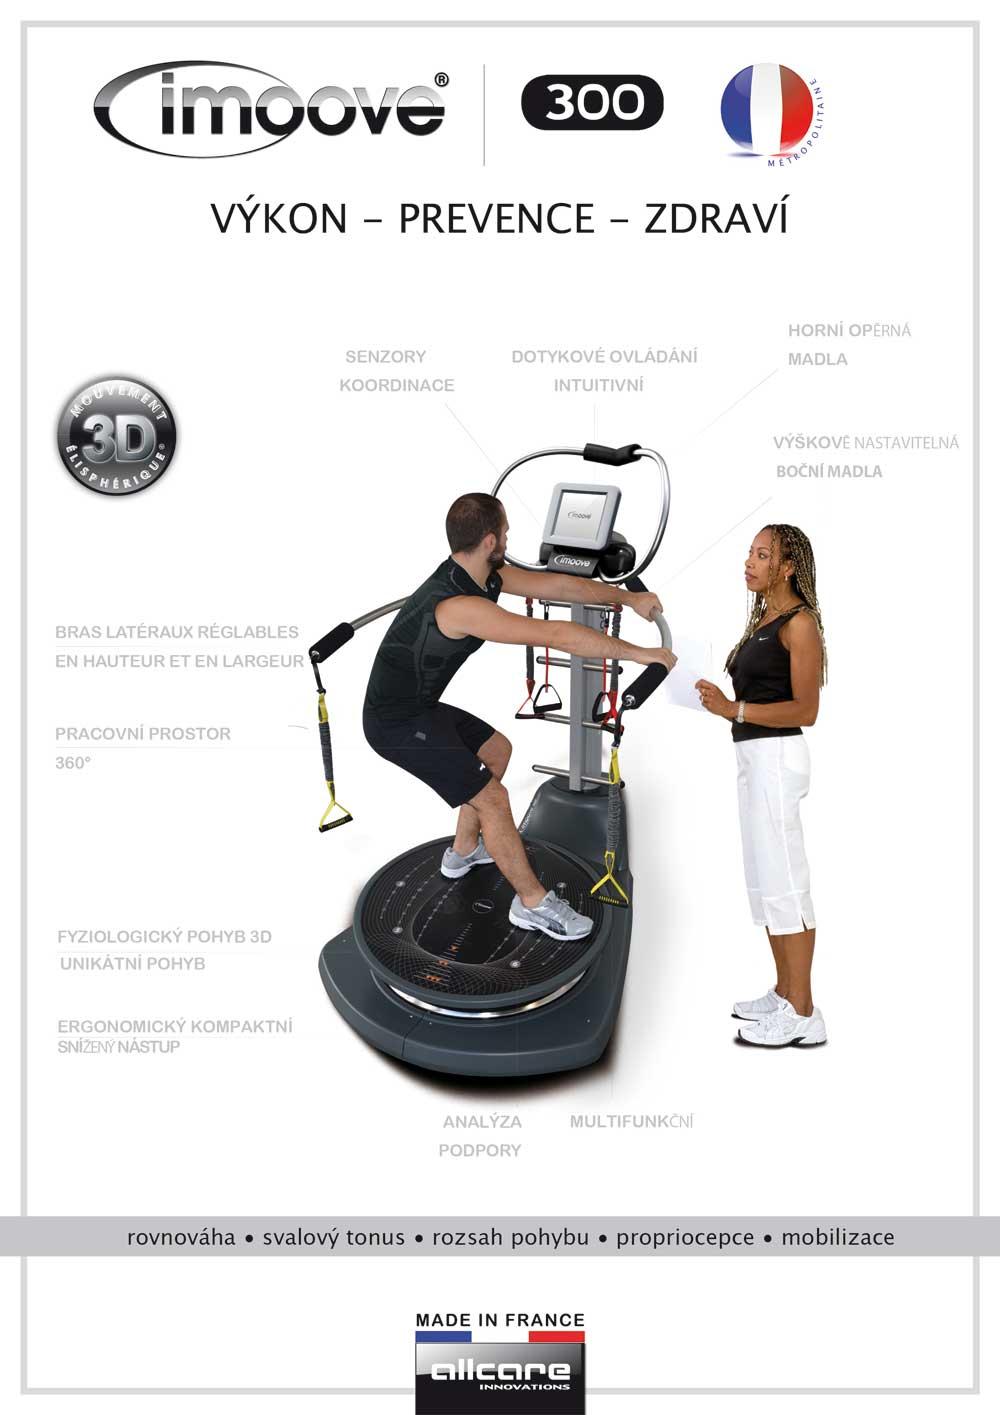 Letak-Imoove-300-FR-hd-str-1-WEB